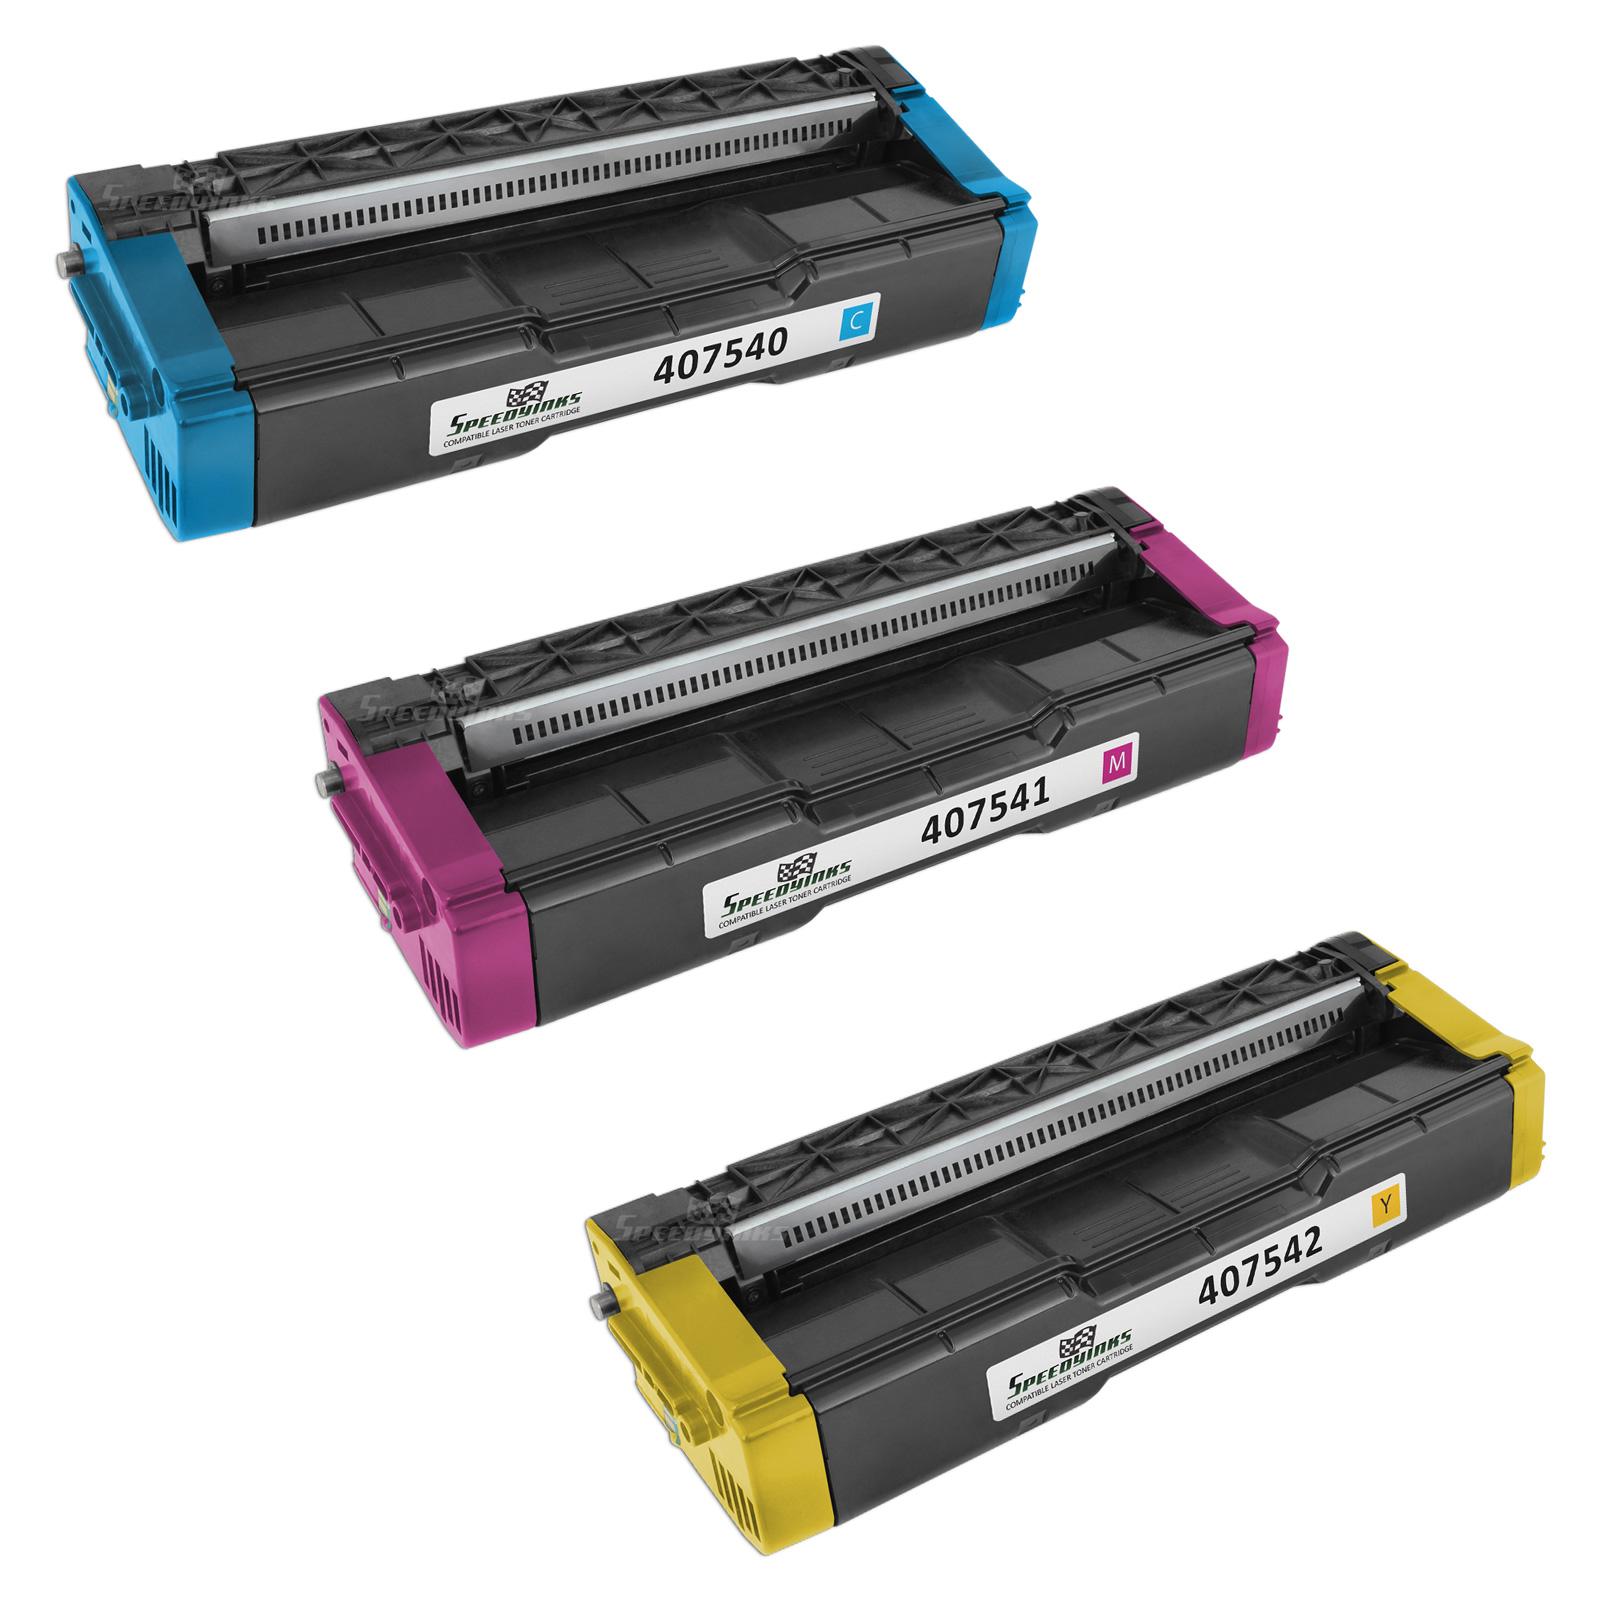 Ricoh SP C250A Original Toner Cartridge Magenta 407541